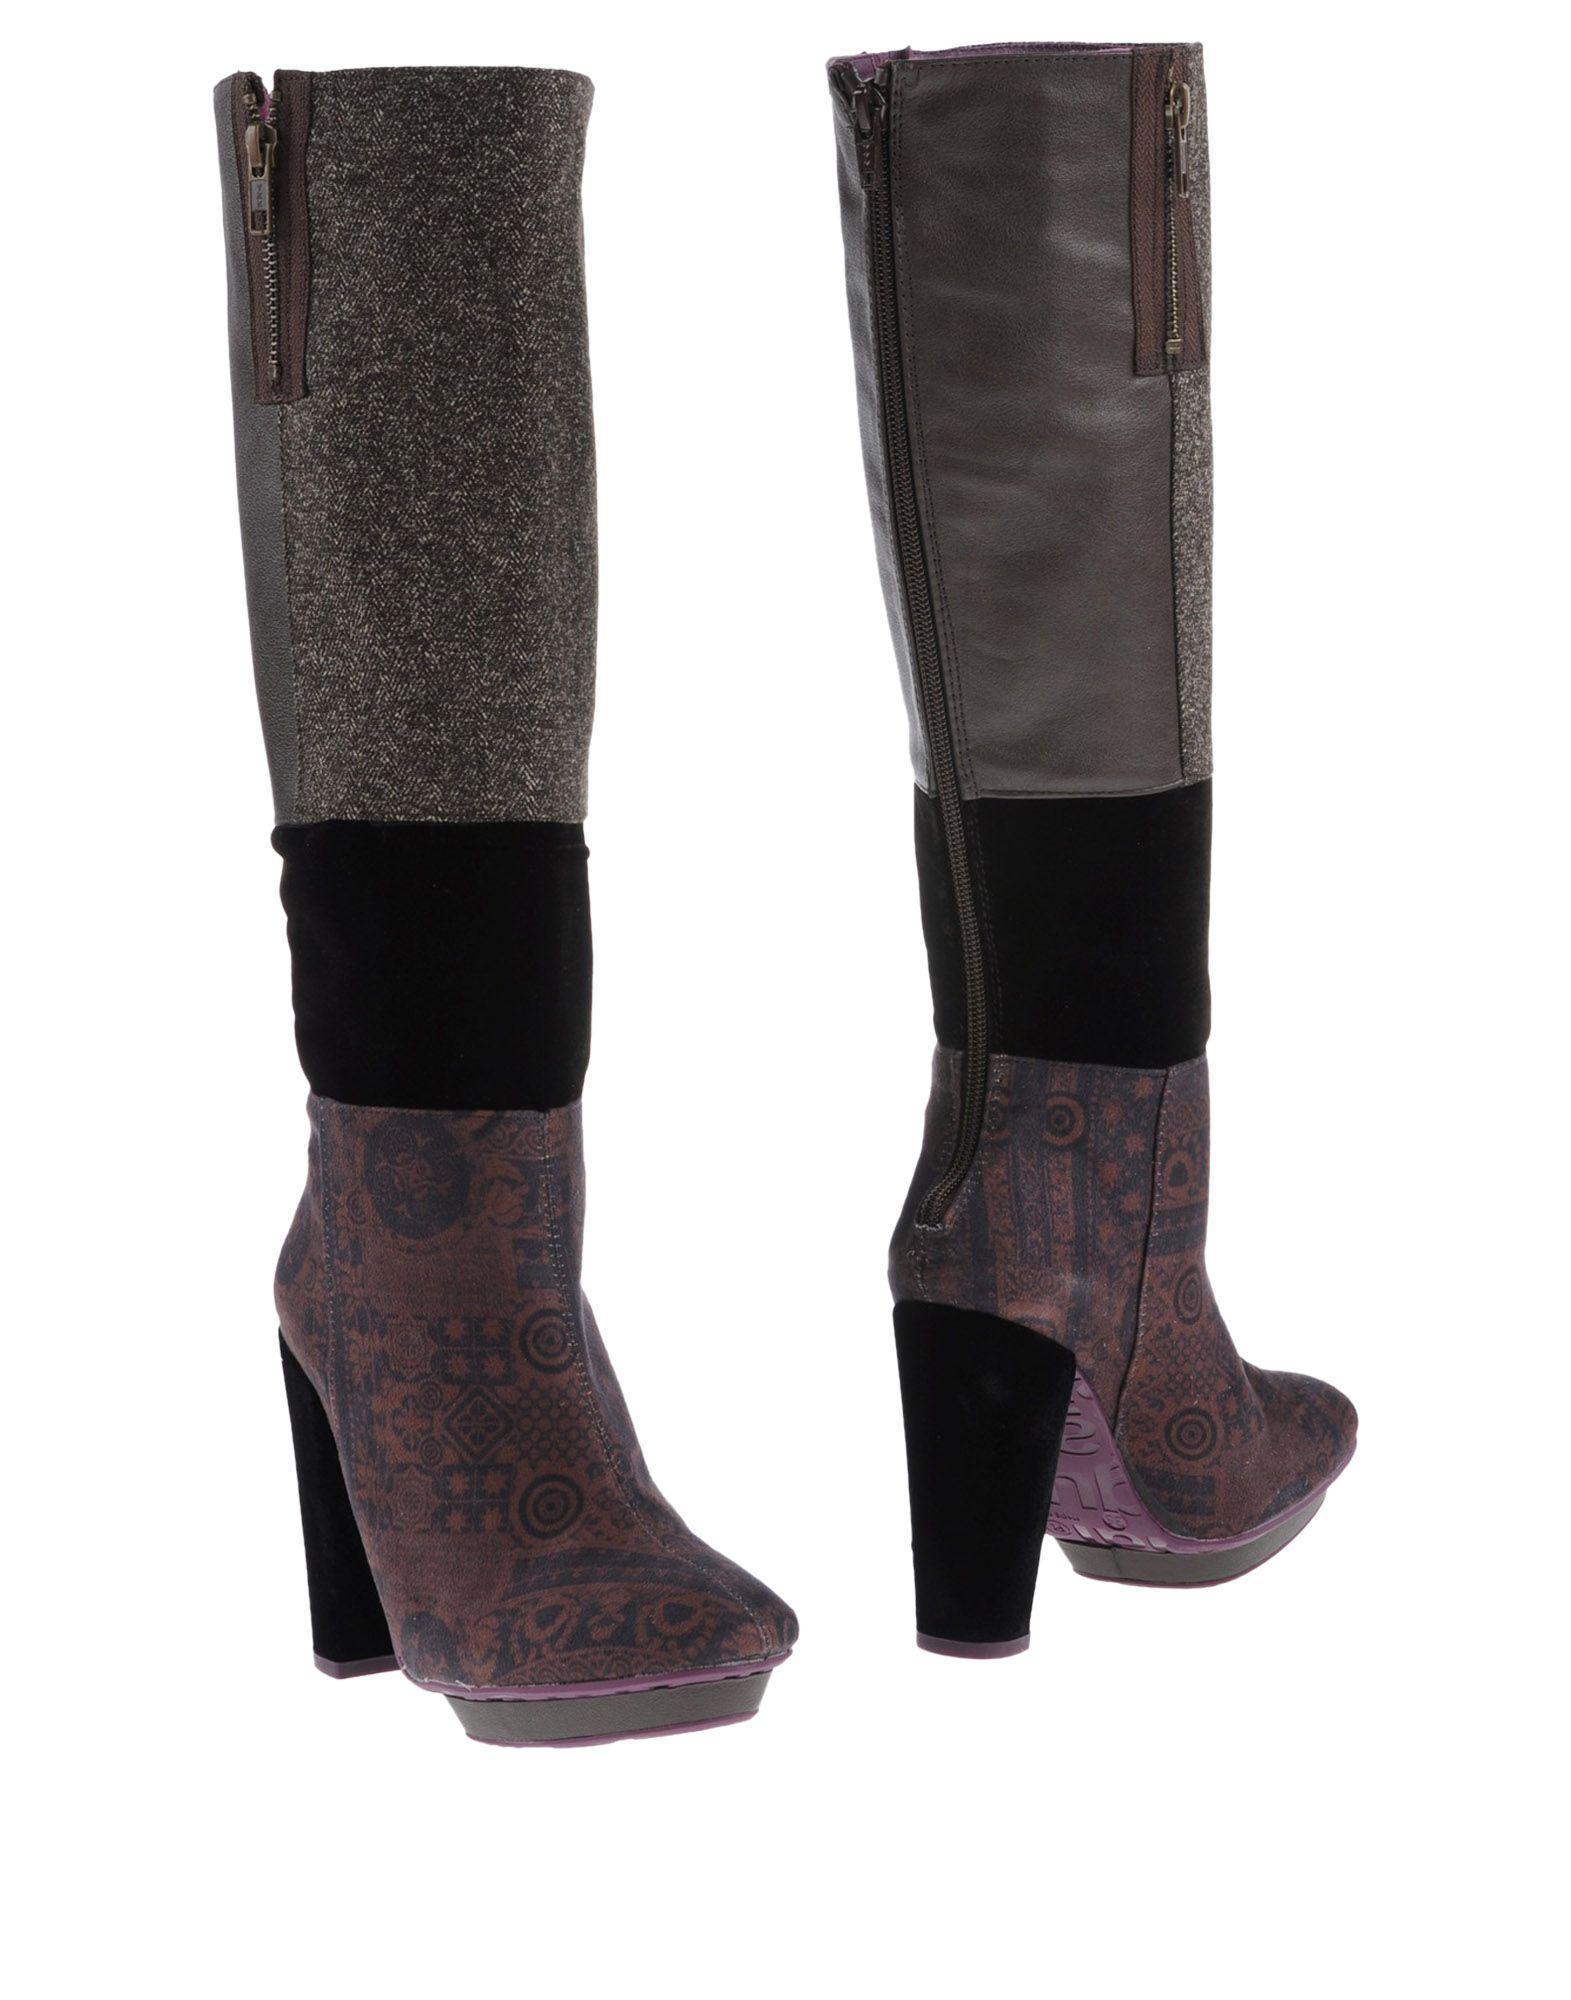 Desigual Stiefel Damen  11181495DI Gute Qualität beliebte Schuhe